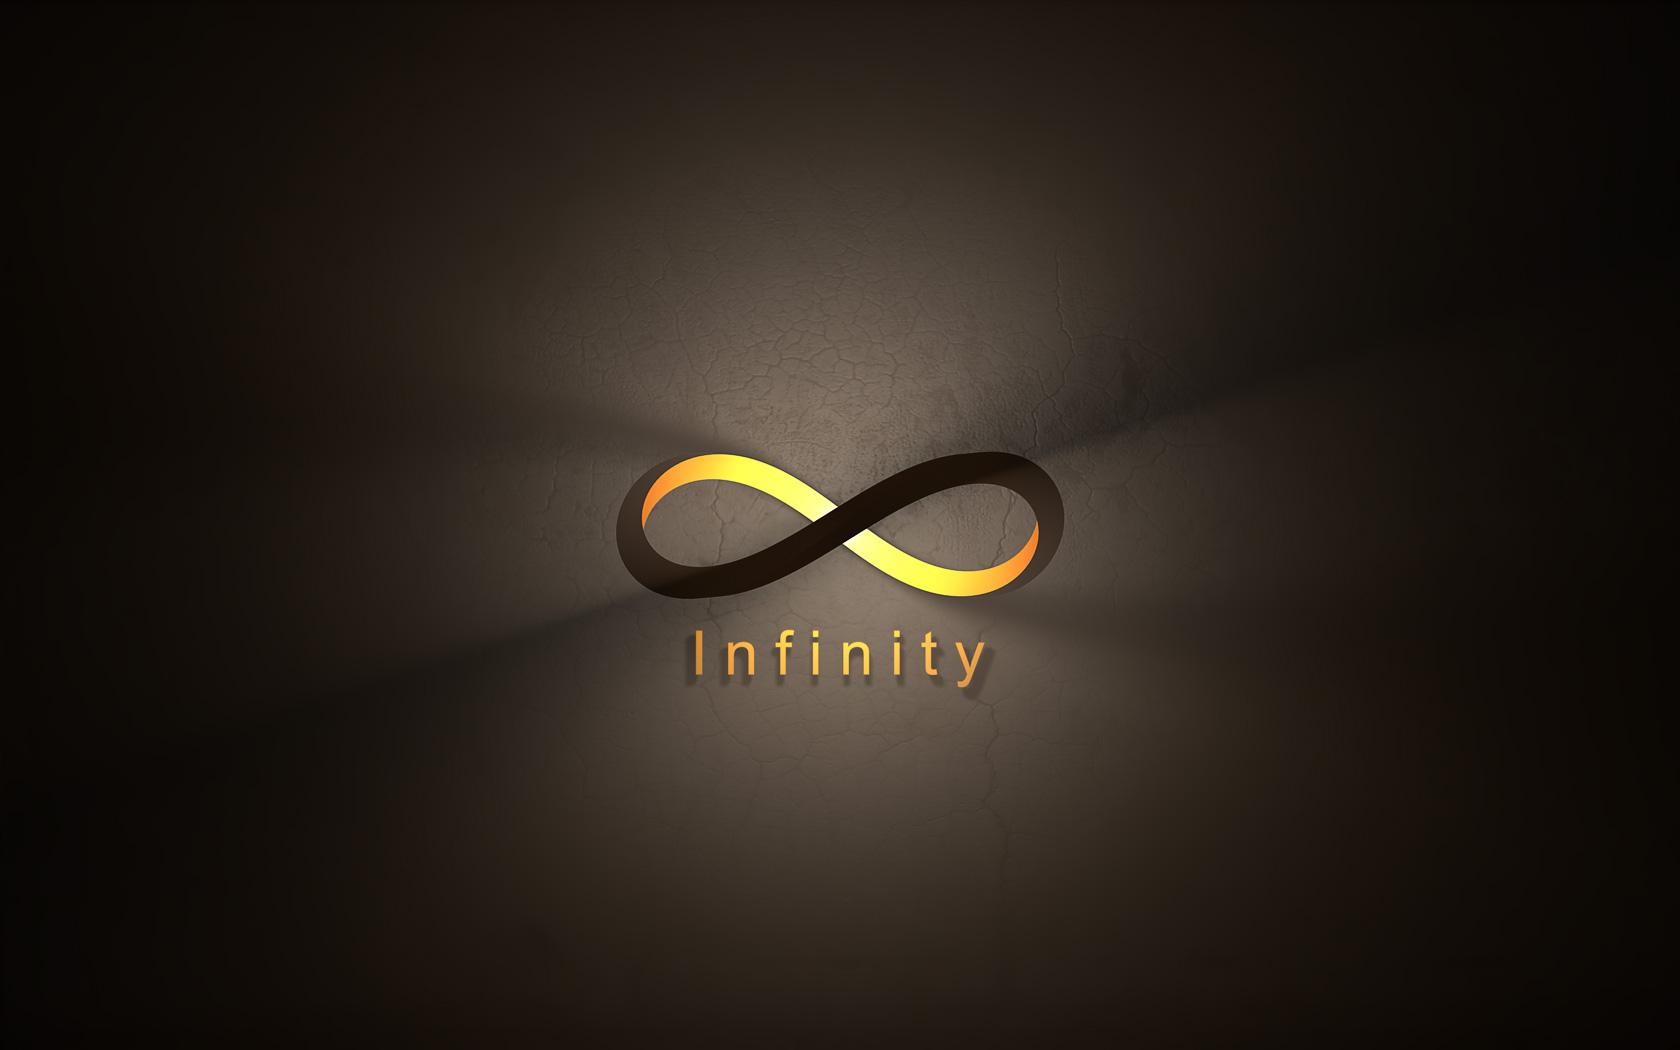 Infinity - infinity sign